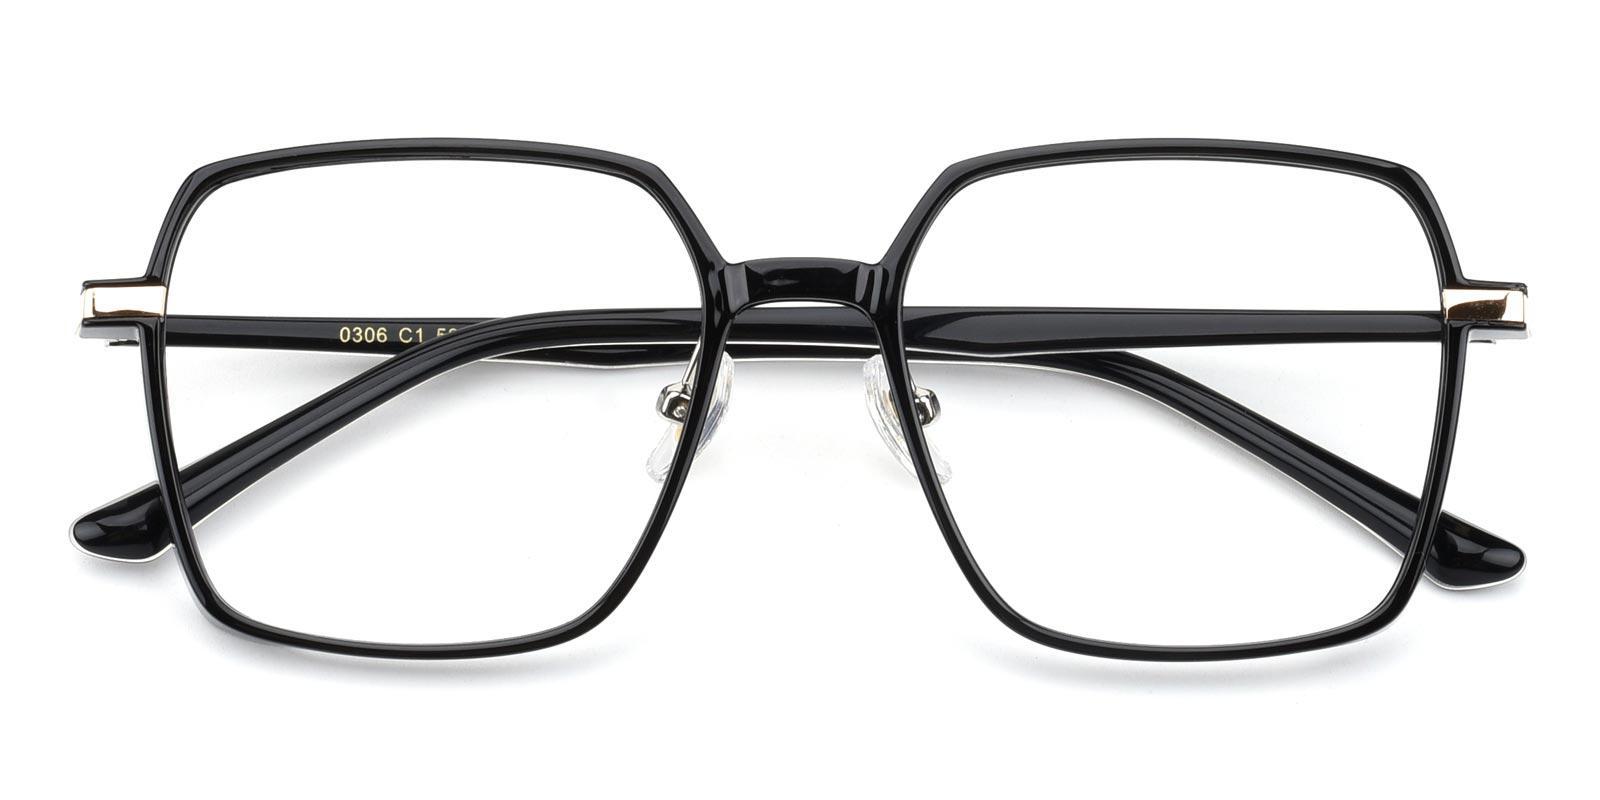 Decent-Black-Geometric-Acetate-Eyeglasses-detail